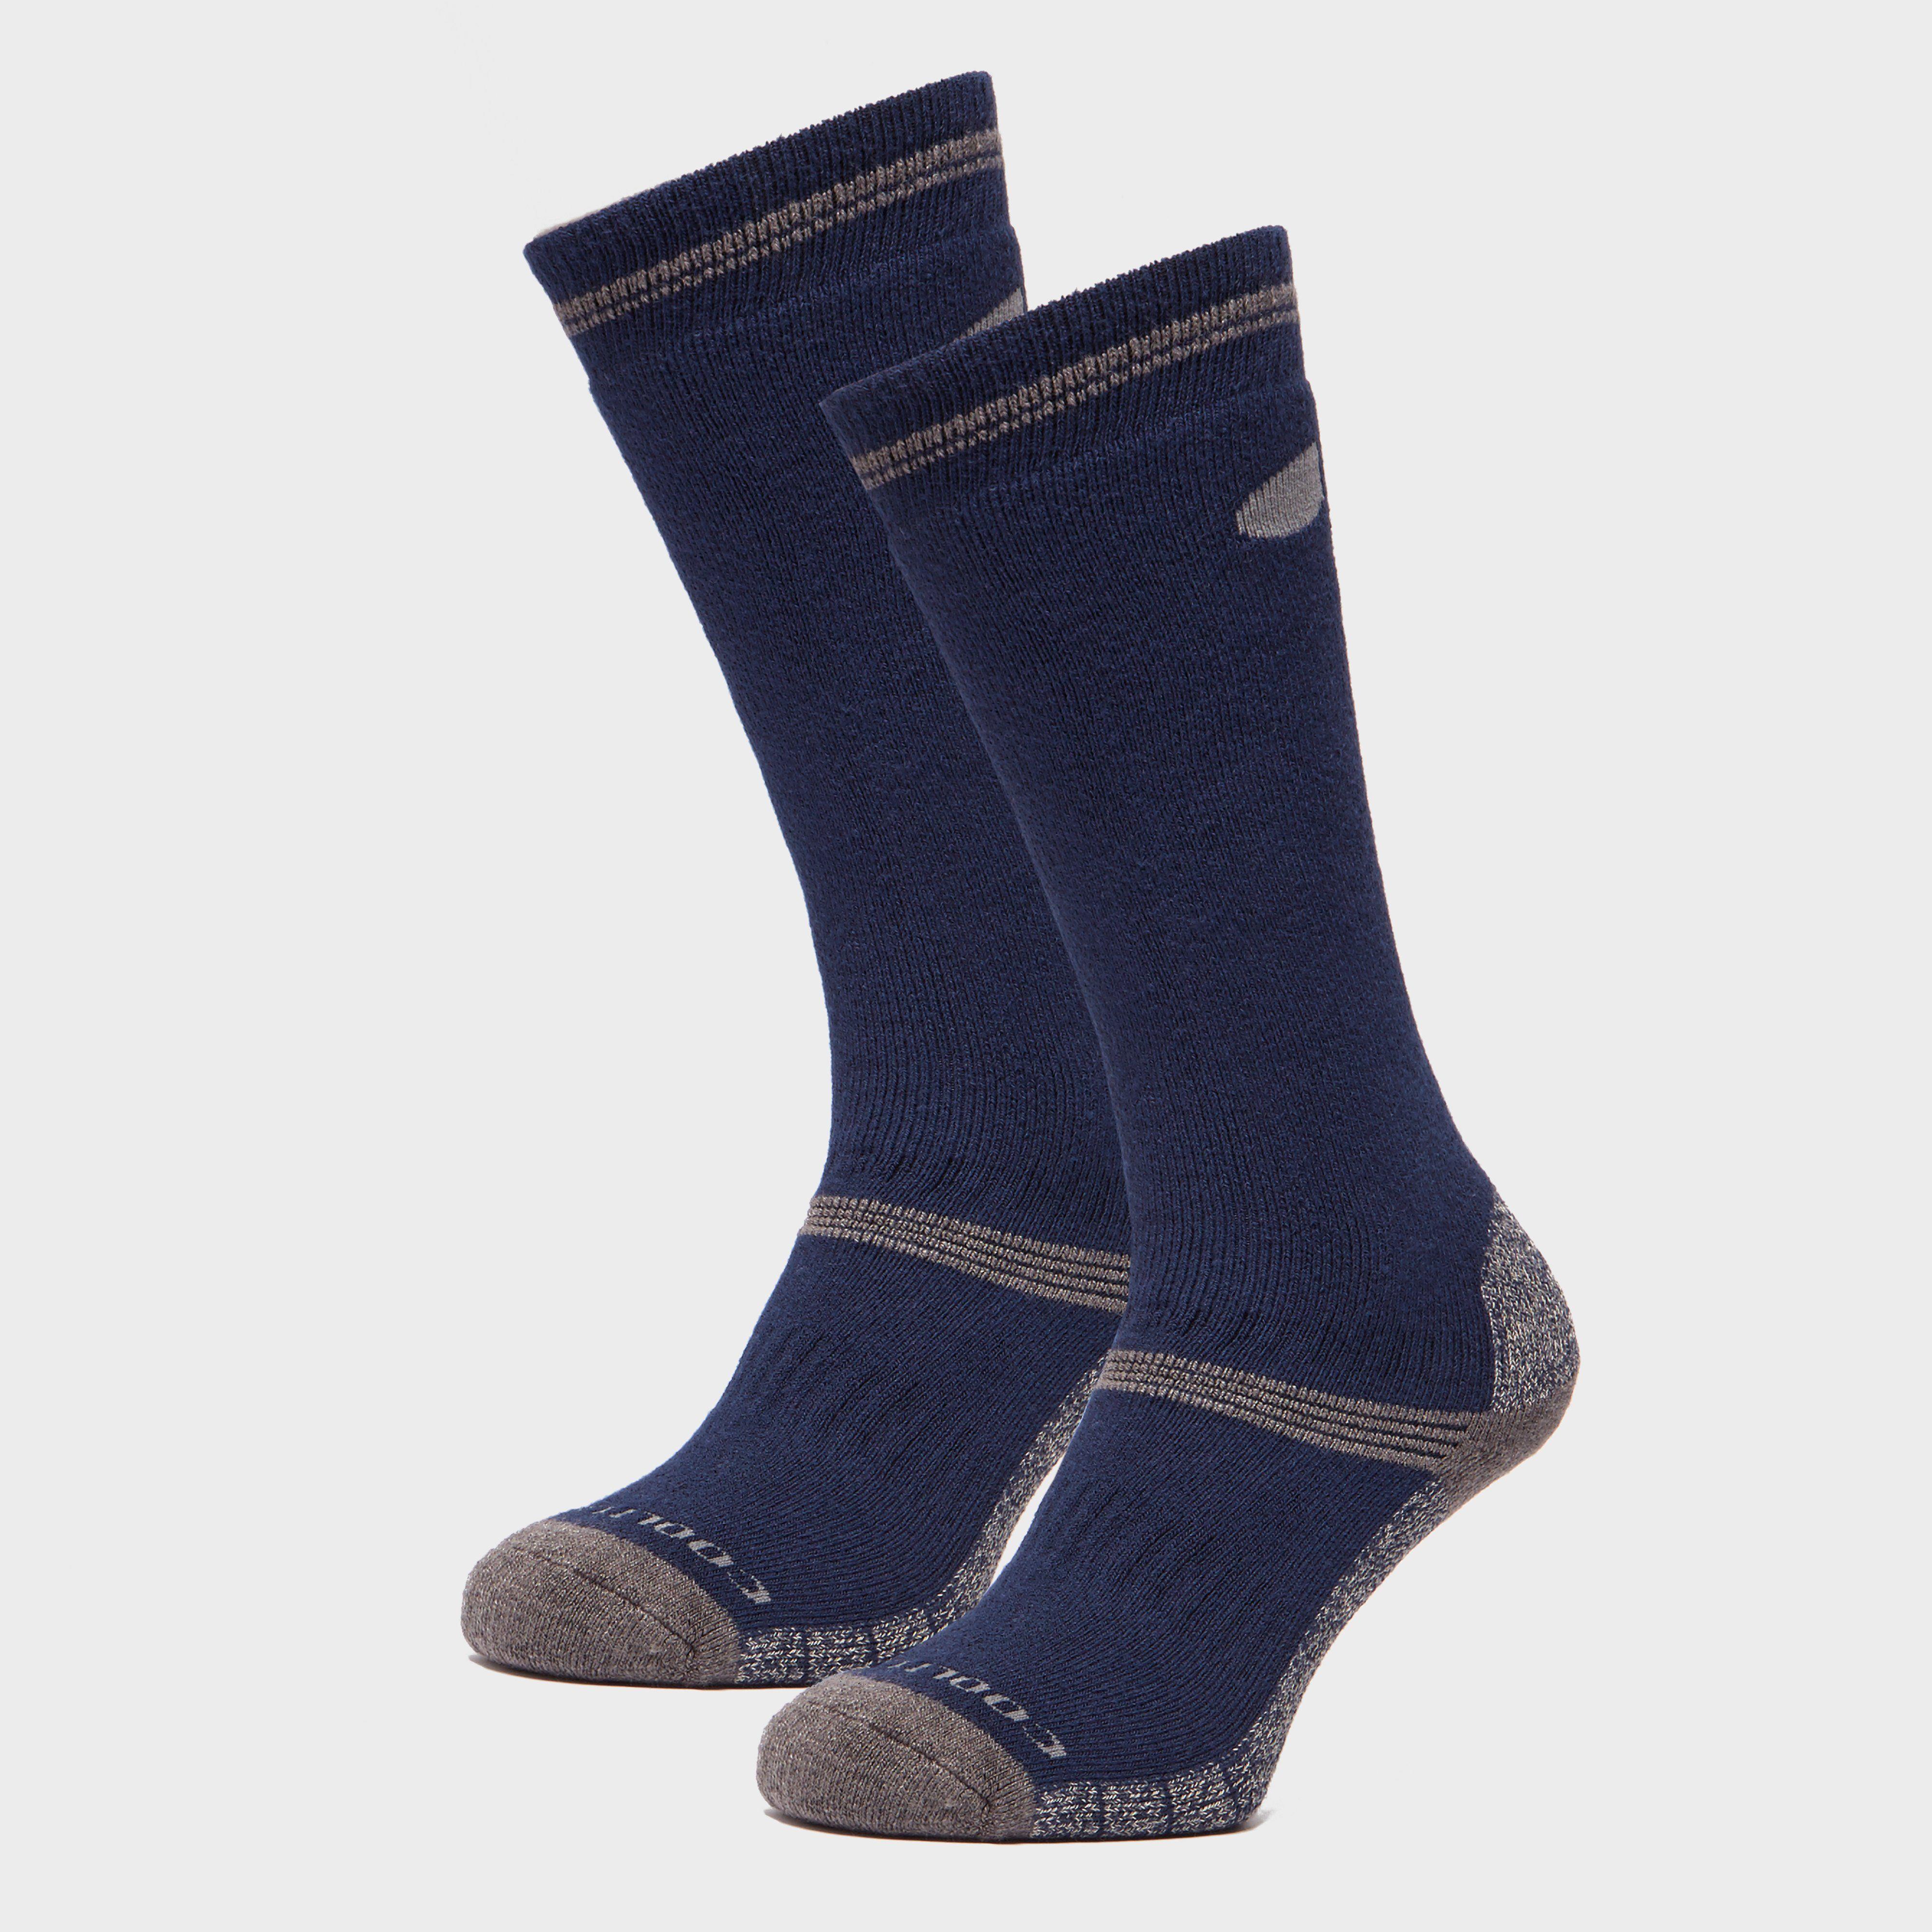 PETER STORM Midweight Knee Length Socks - 2 Pack